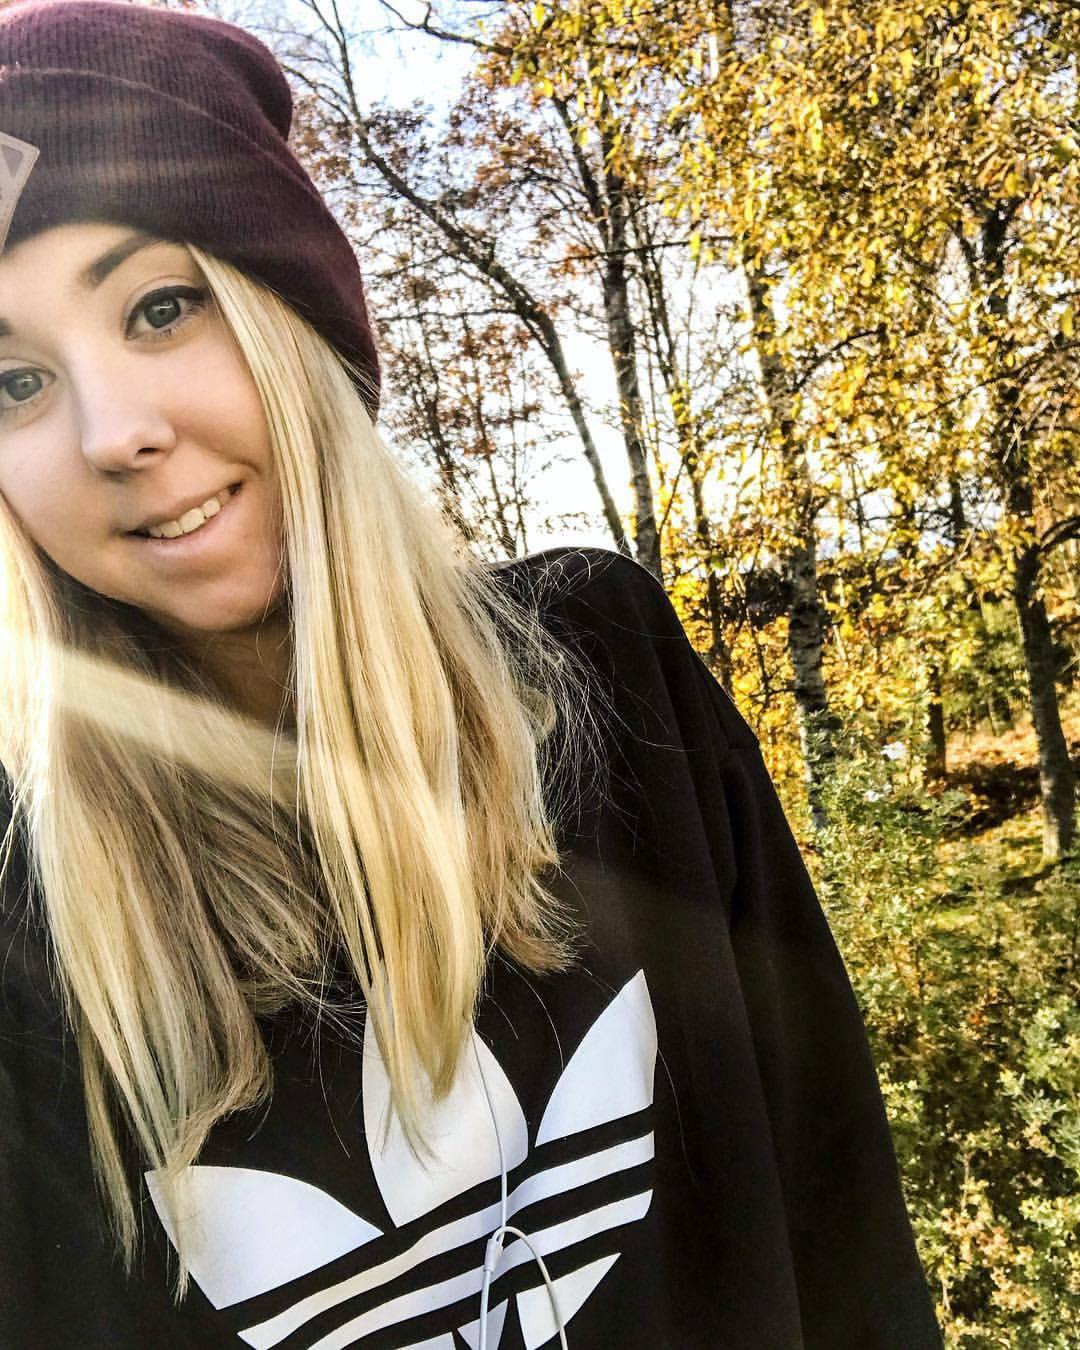 My name is Amanda Ekström